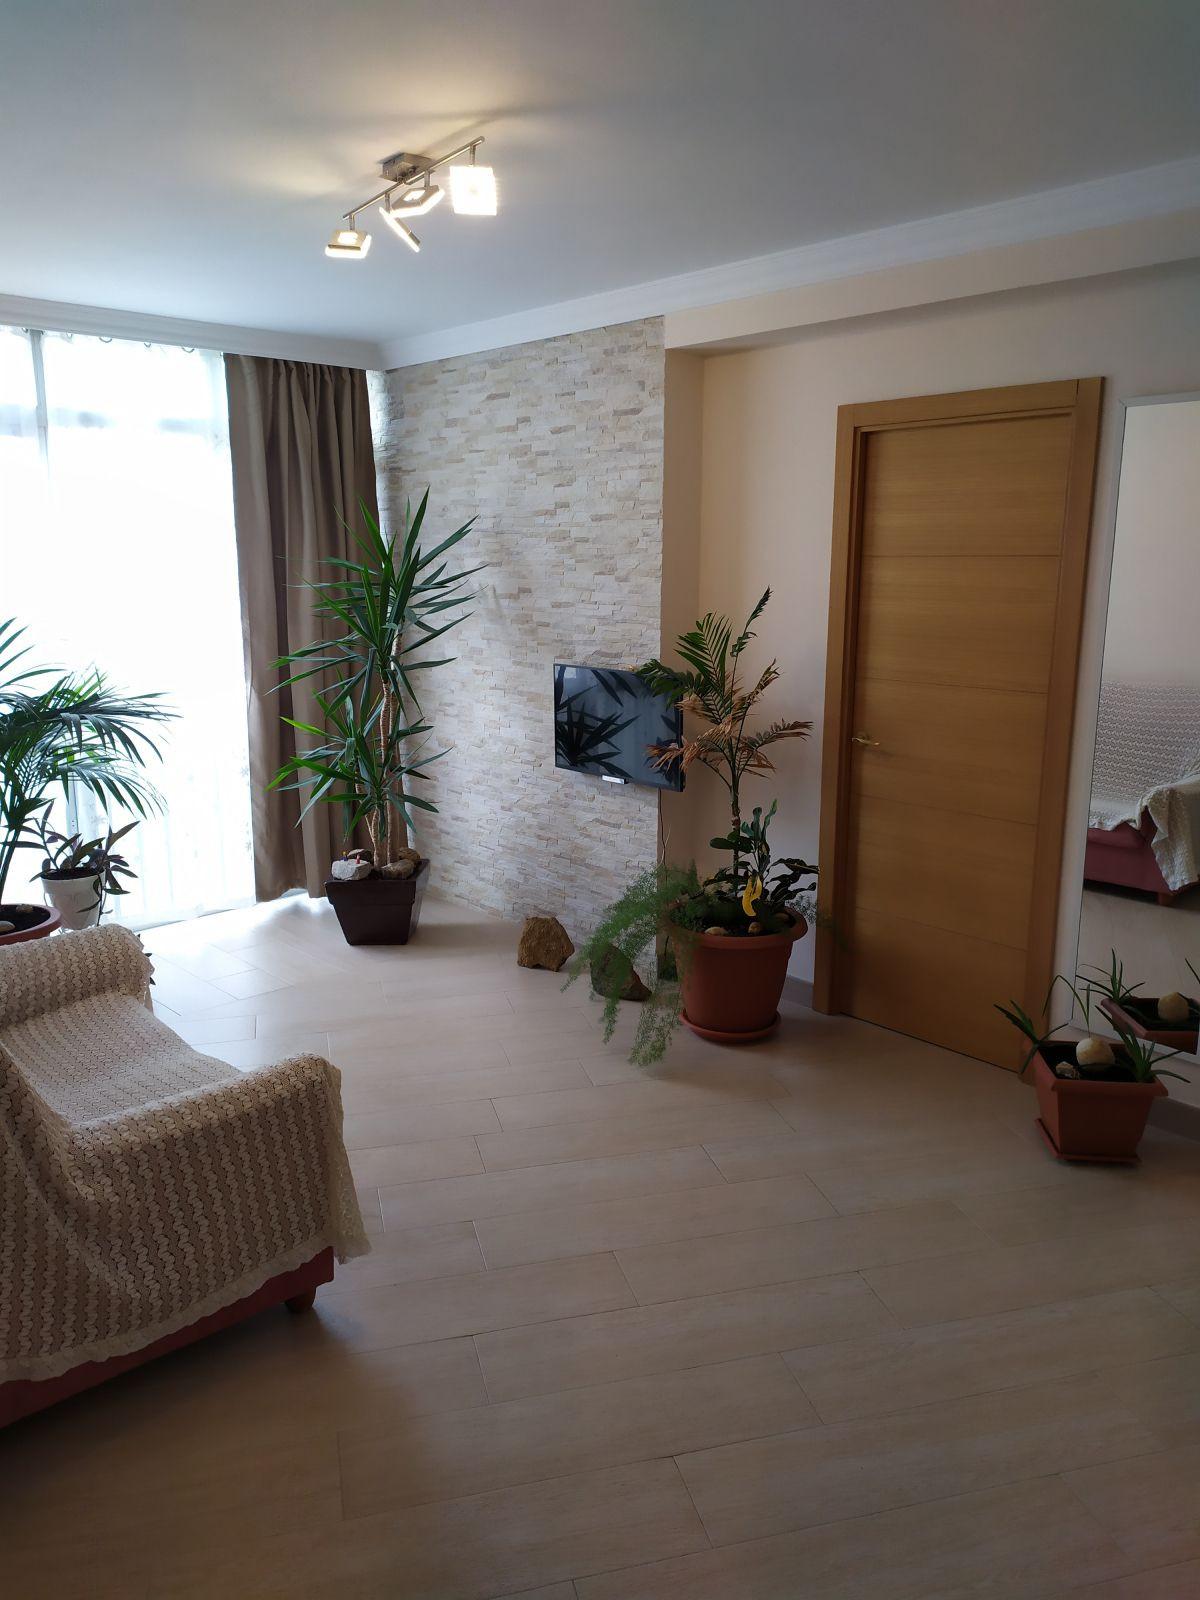 Apartamento - Fuengirola - R3639224 - mibgroup.es